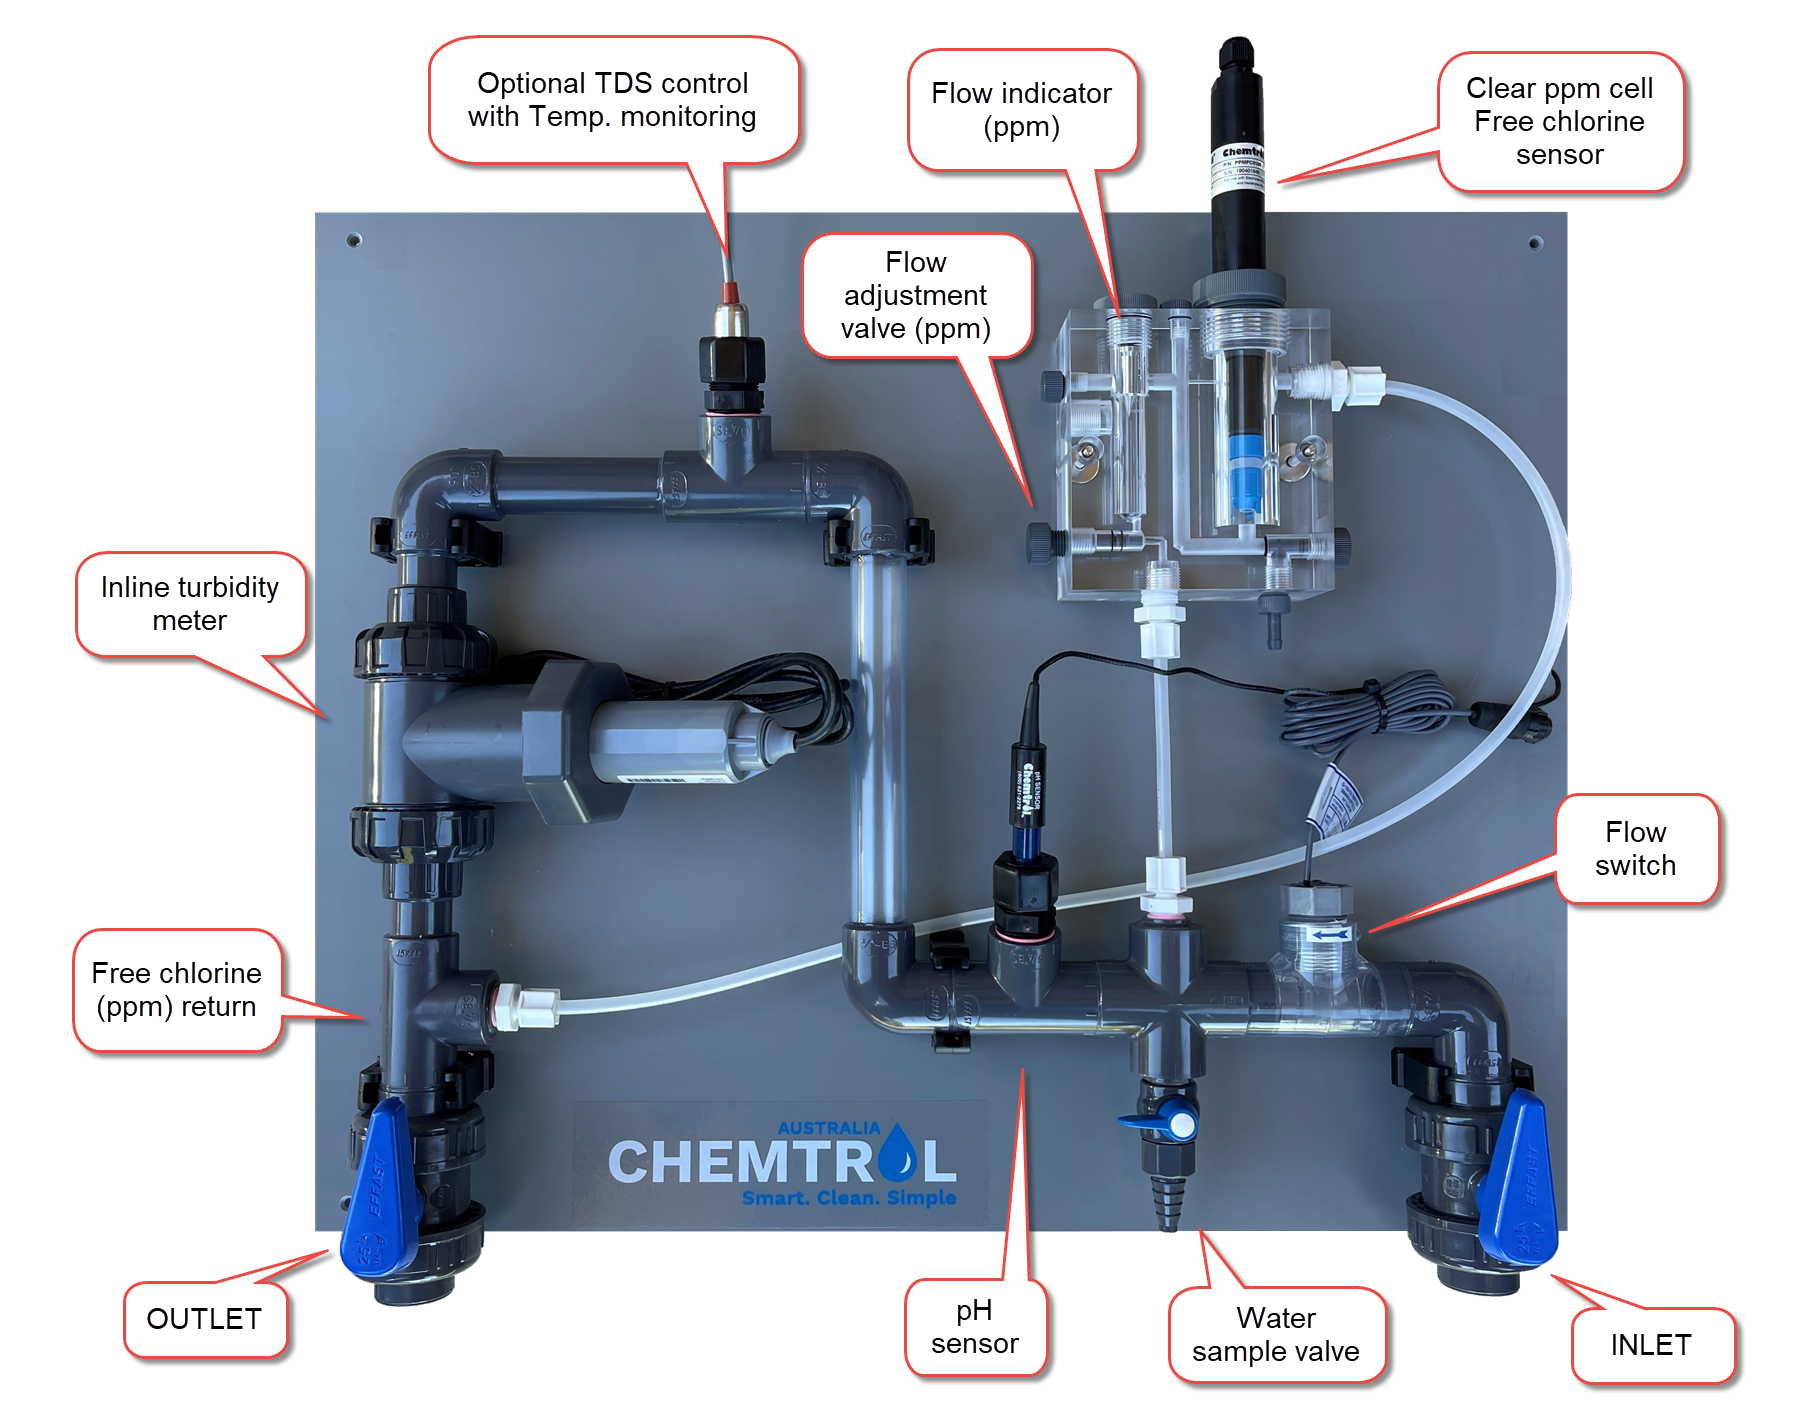 MODEL 1: POTABLE WATER - Image